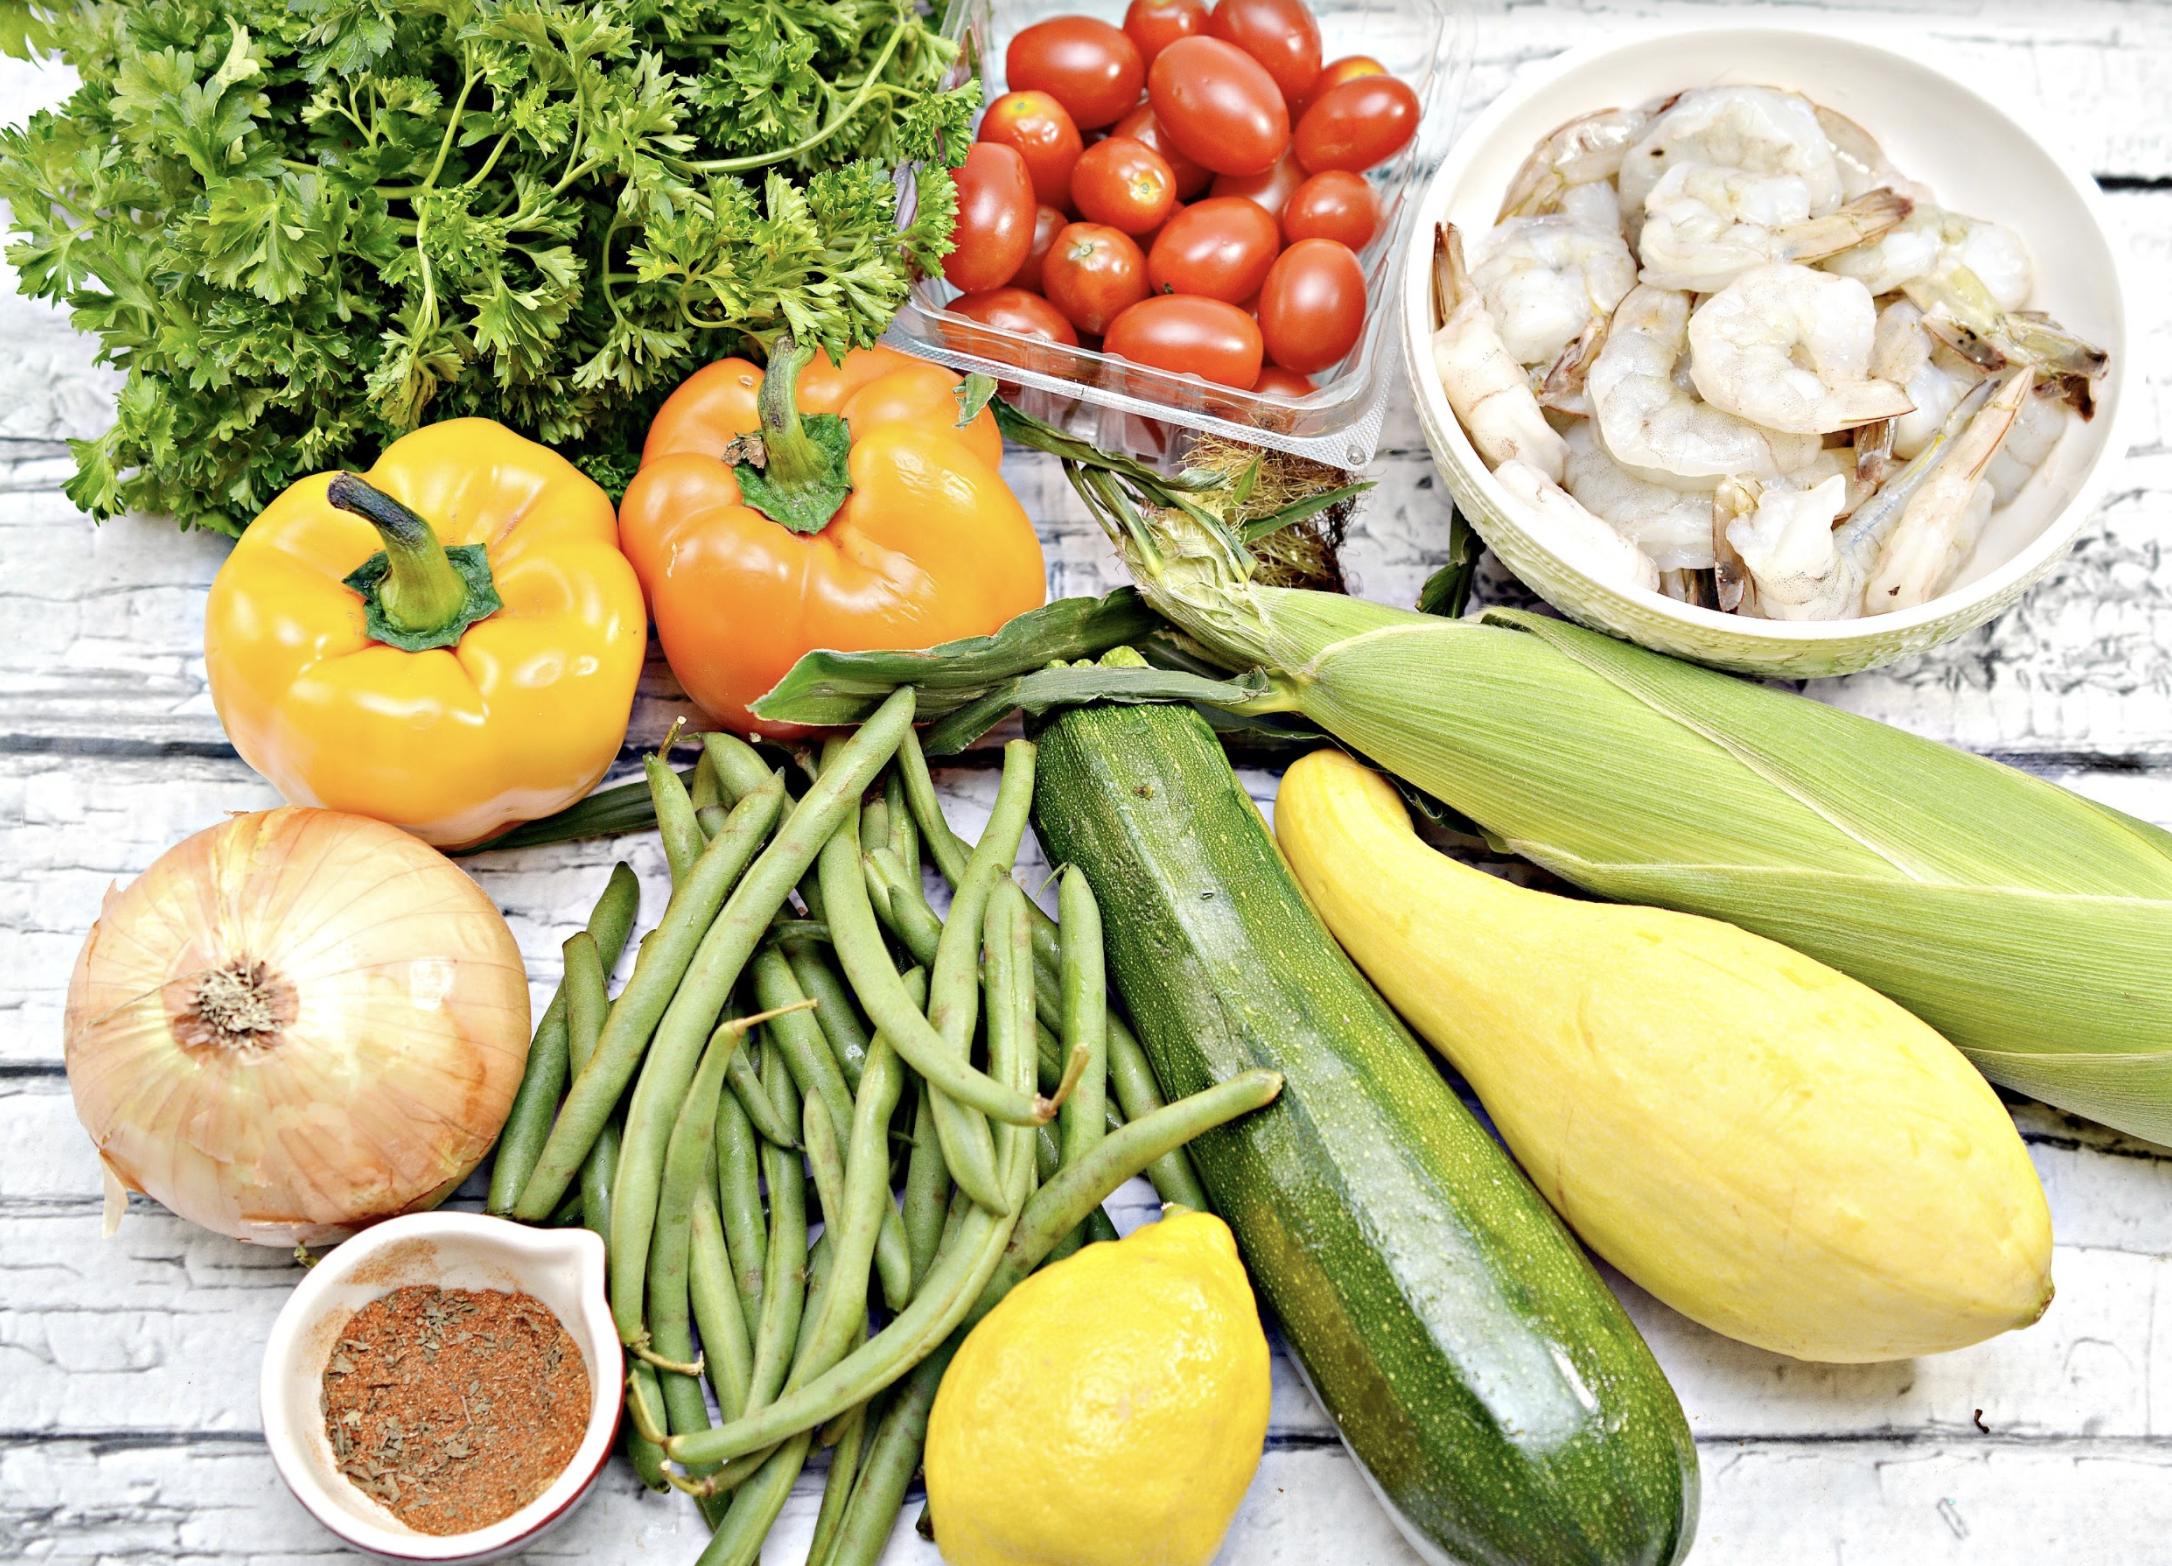 fresh veggies and shrimp for shrimp and veggies foil packs recipe